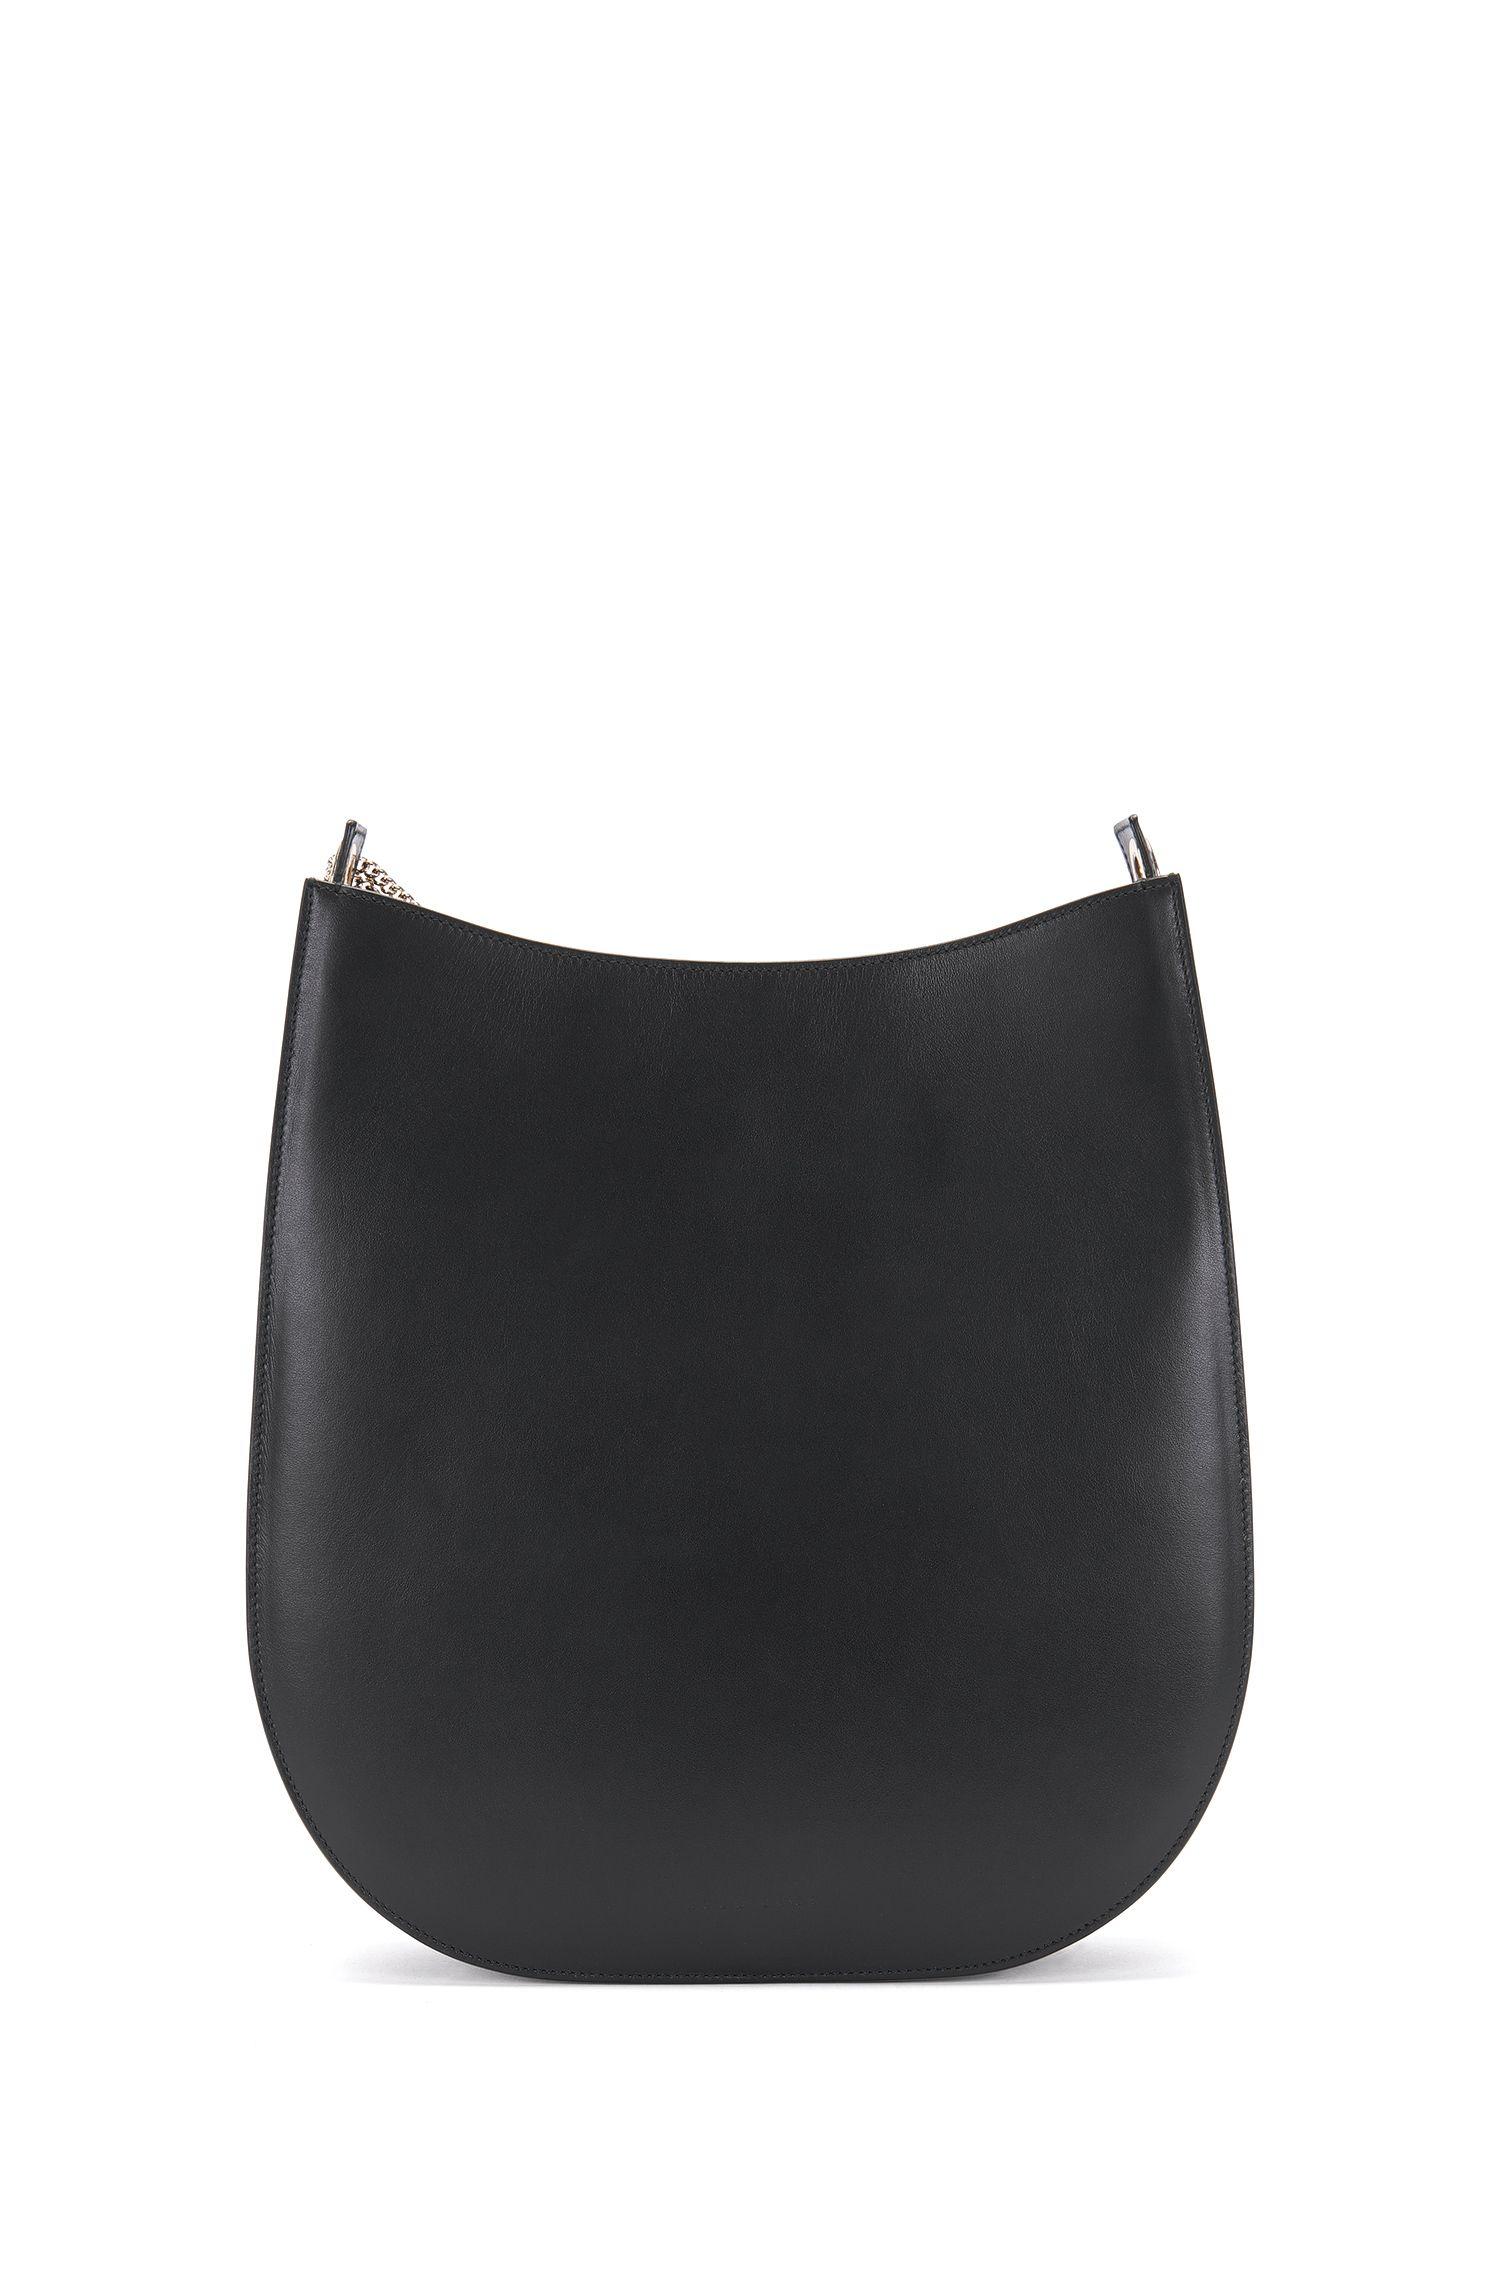 'BOSS Bespoke H S' | Italian Leather Hobo Bag, Detachable Chain Strap